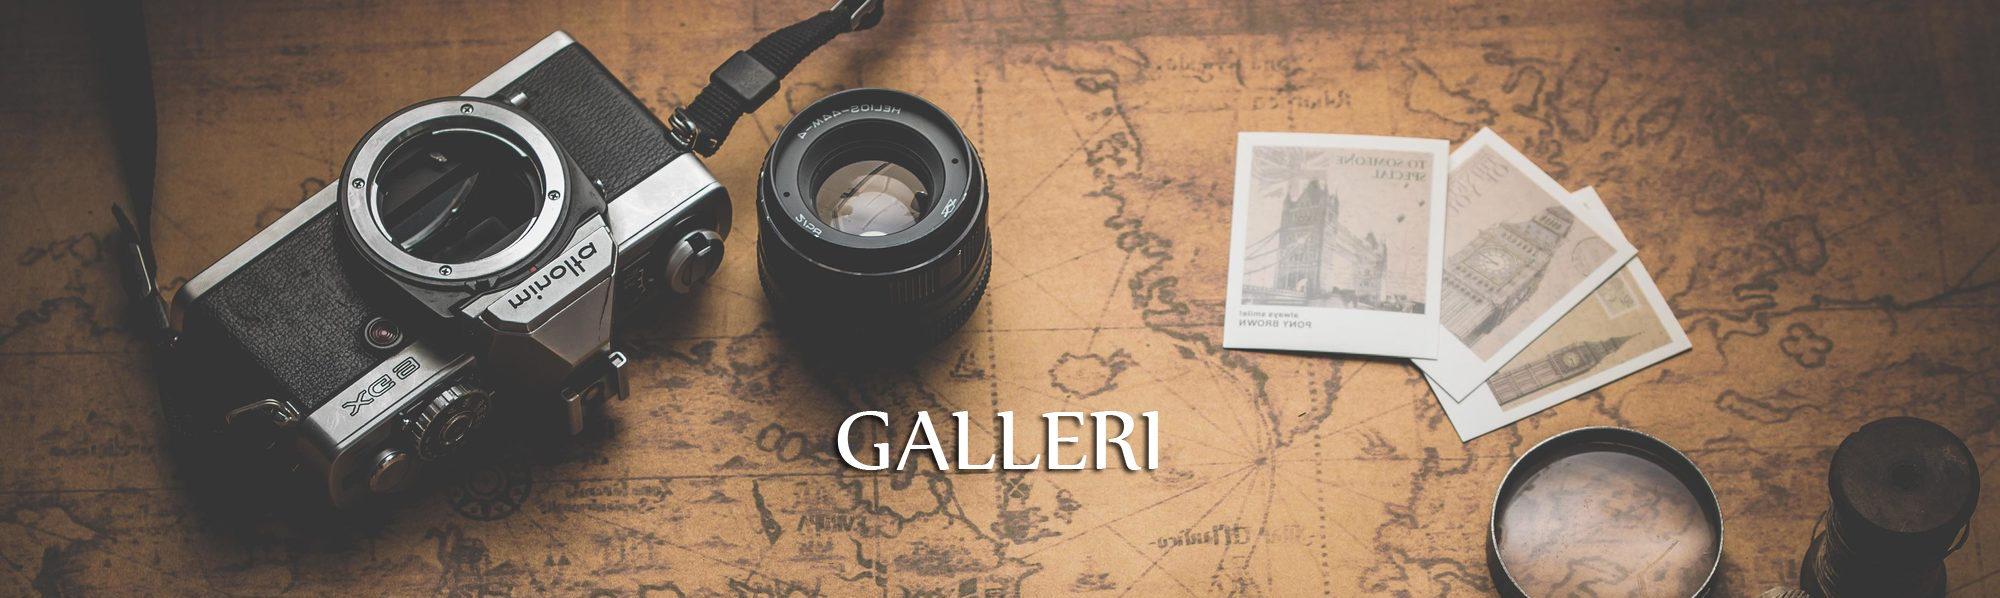 galleri billeder plougheld